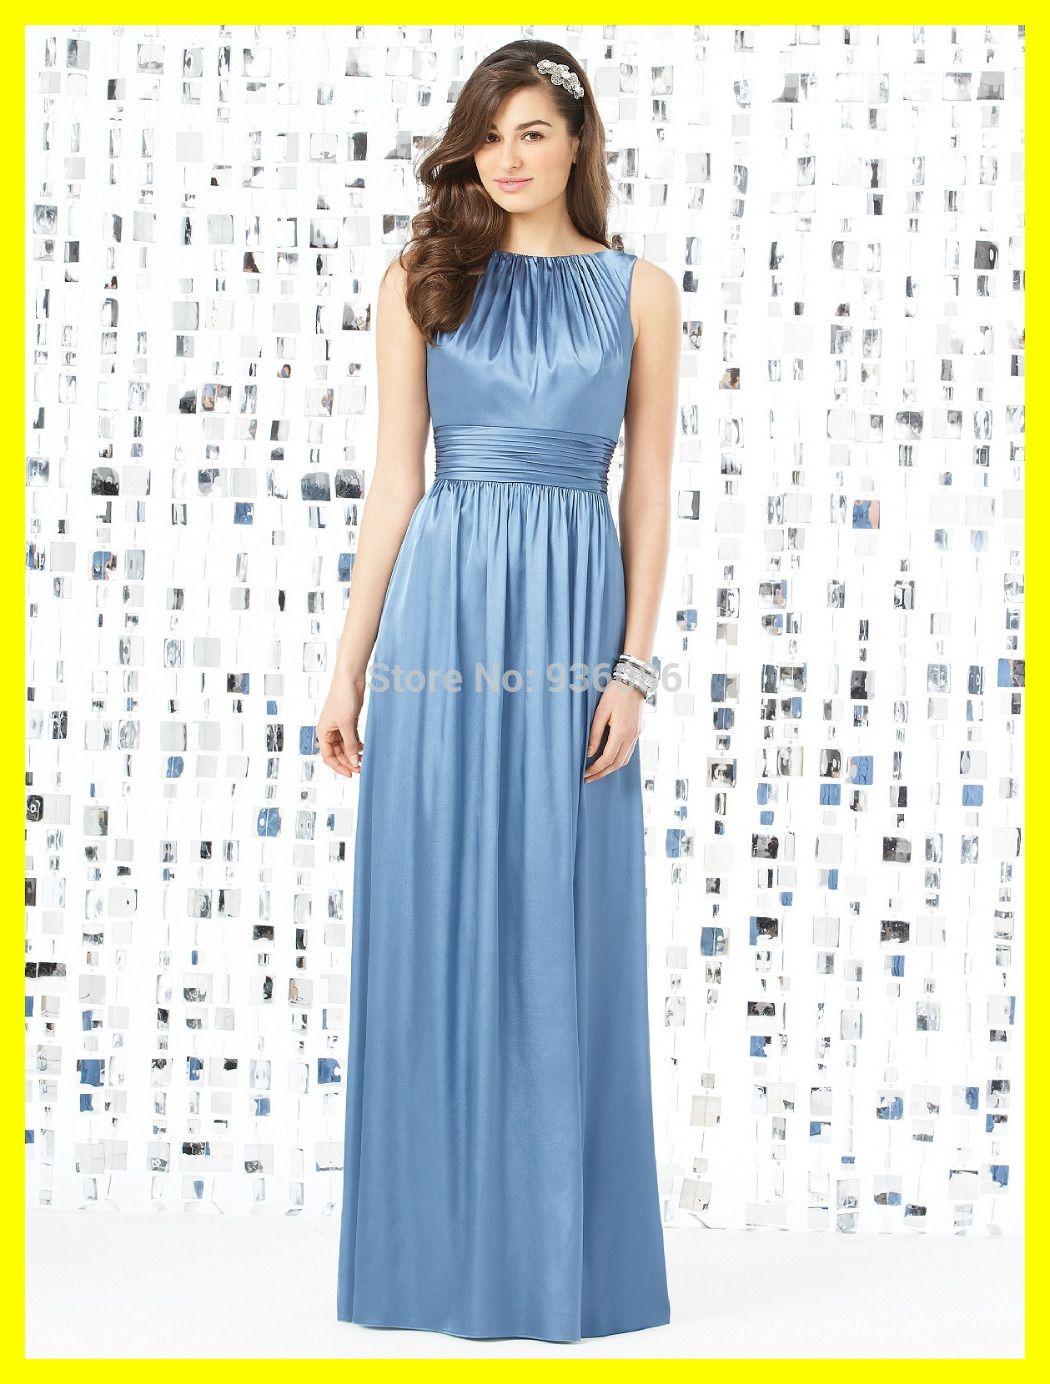 Mr k long dresses for juniors | Color dress | Pinterest | Dresses ...